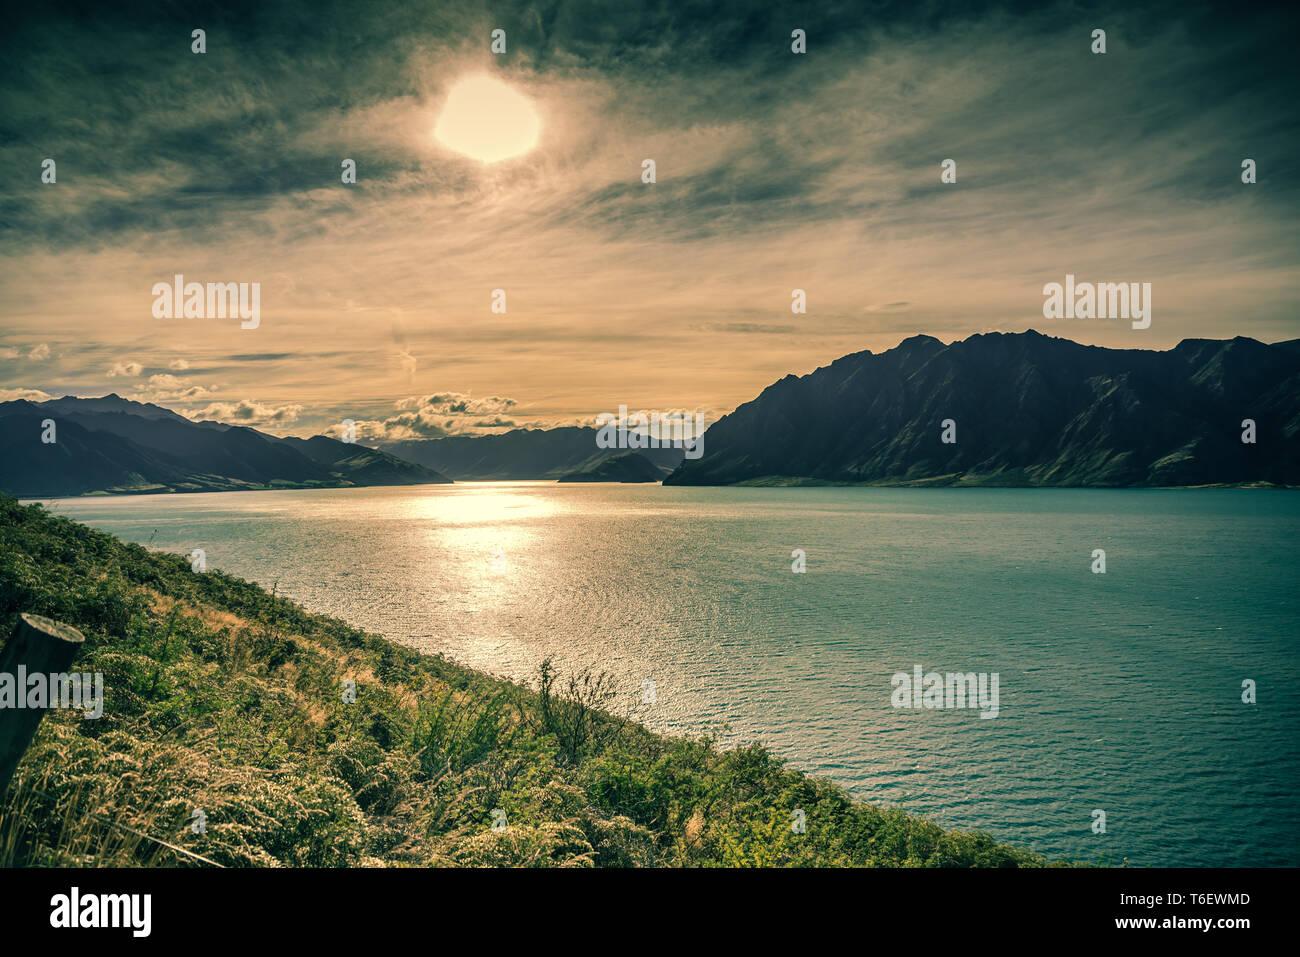 Il lago Wanaka, Isola del Sud, Nuova Zelanda Foto Stock